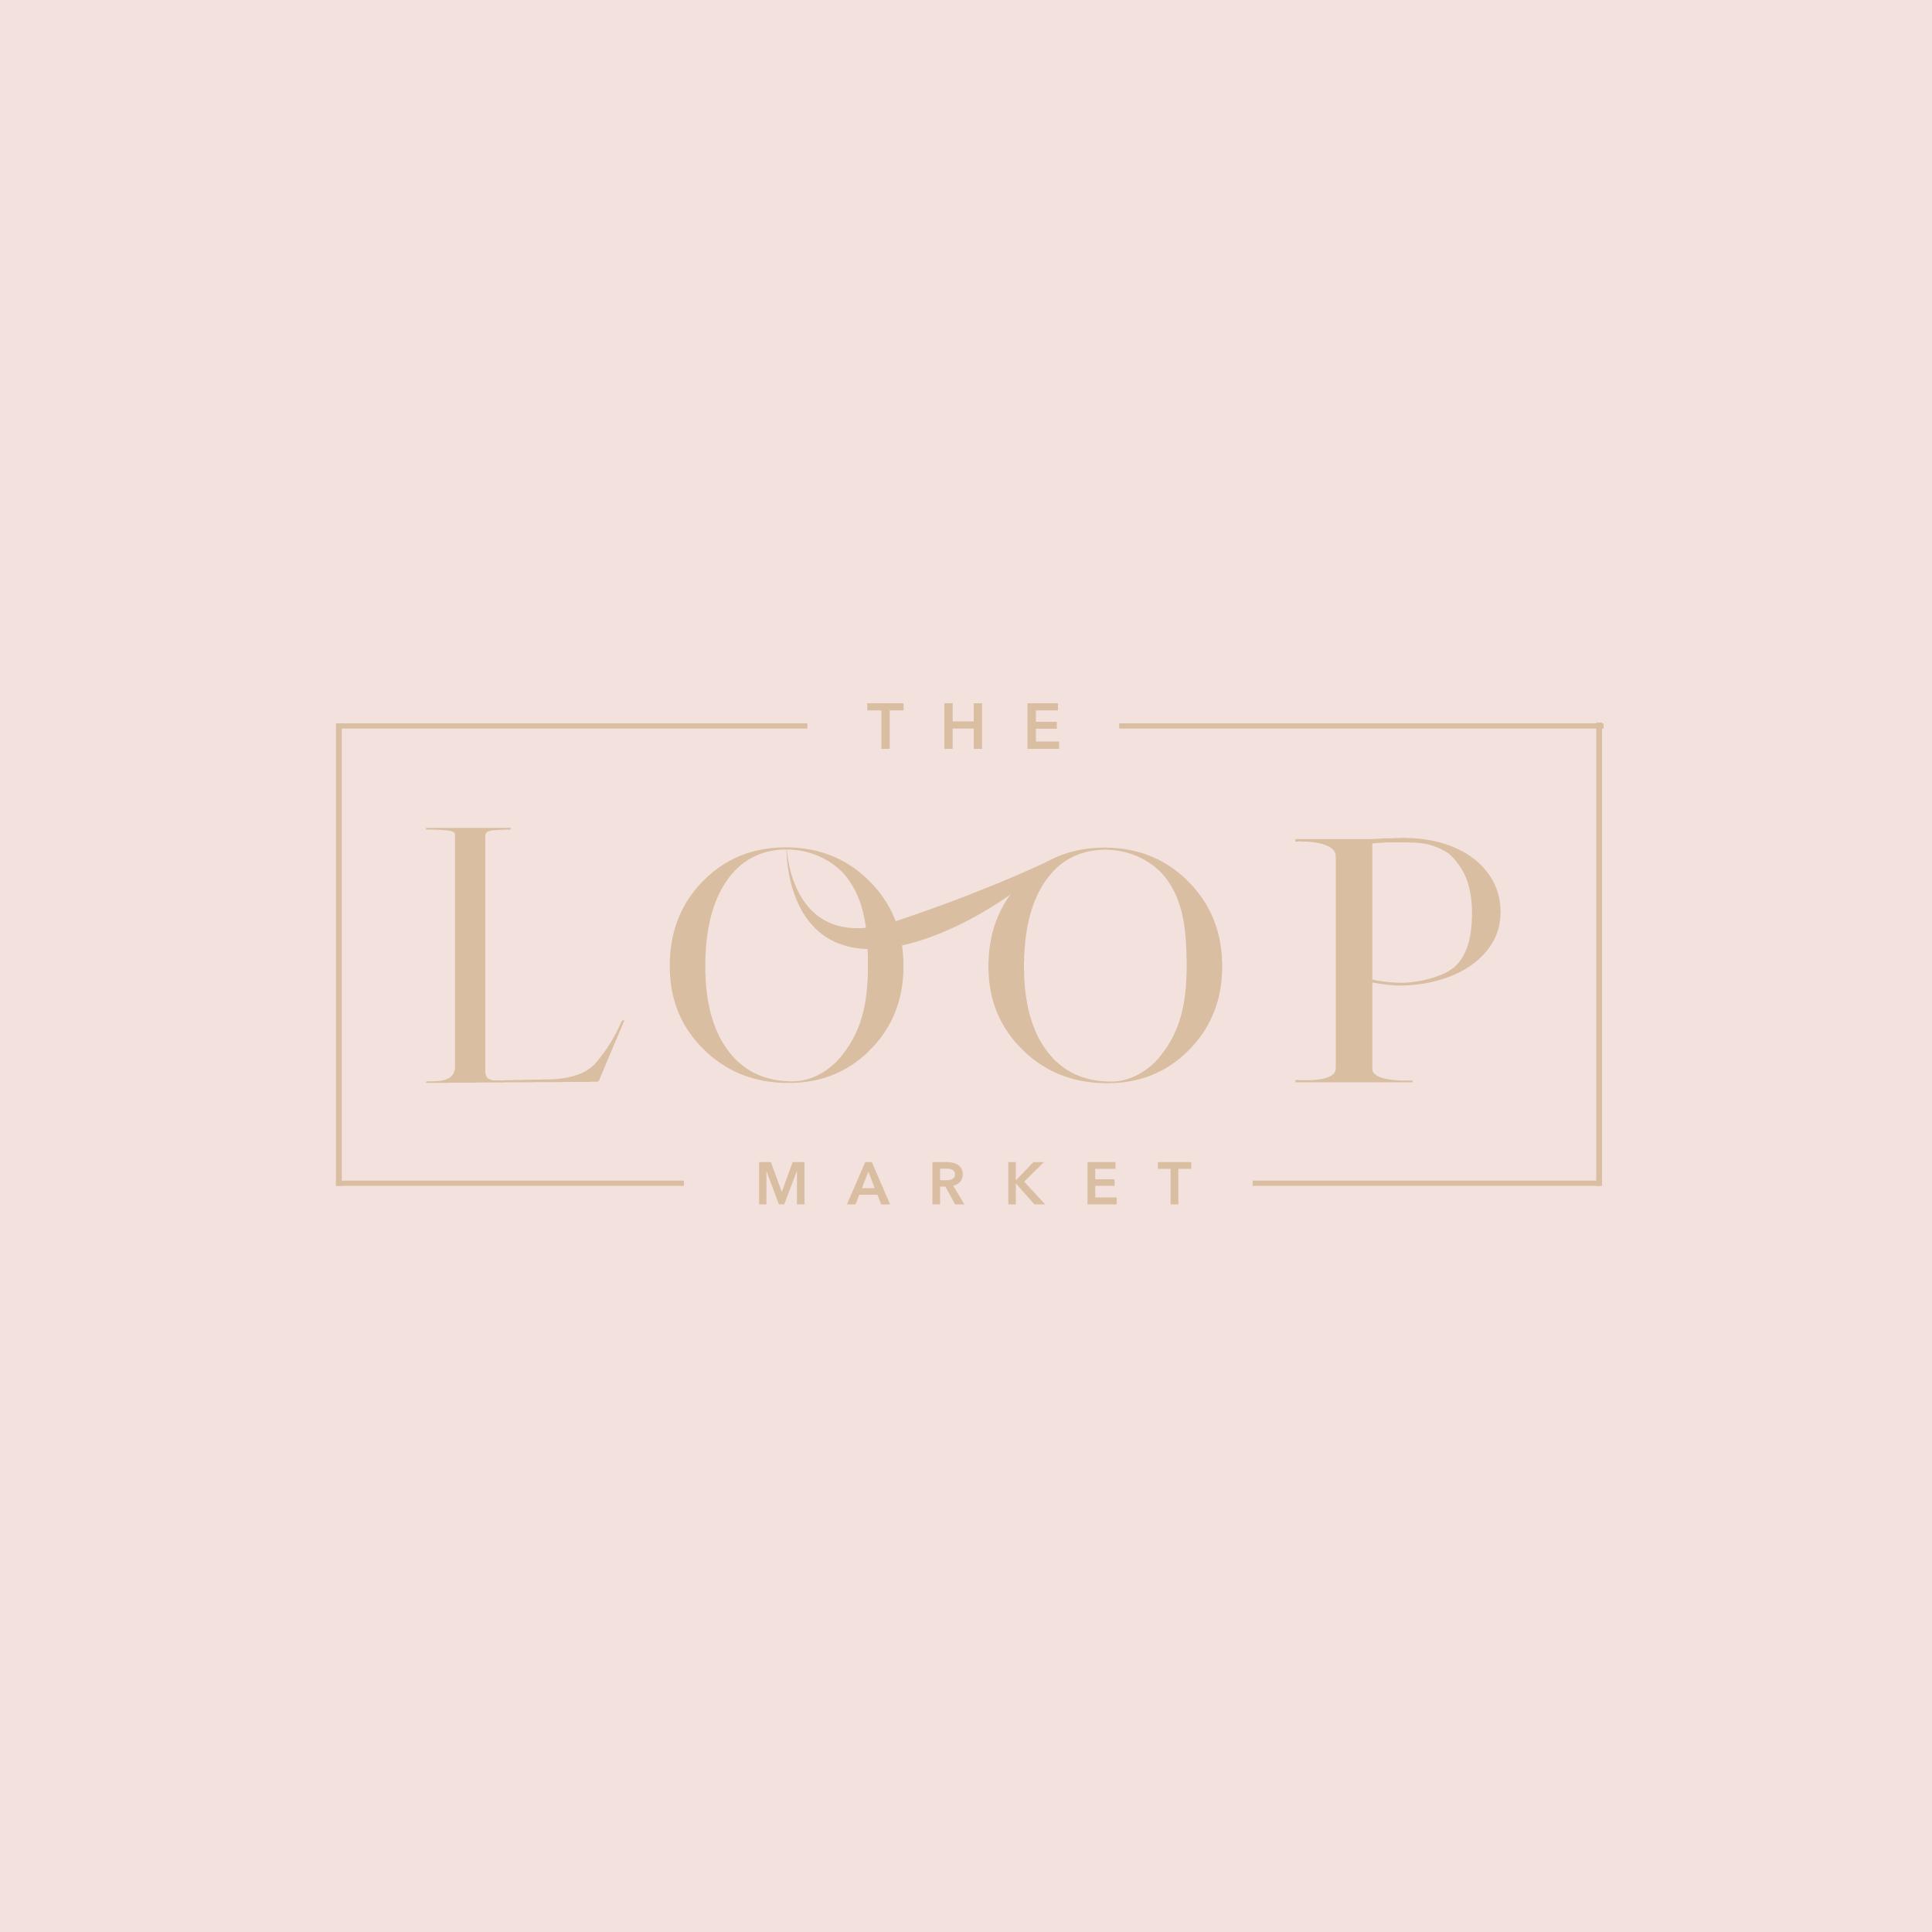 The Loop Market Brand & Logo - Kira Hyde Creative